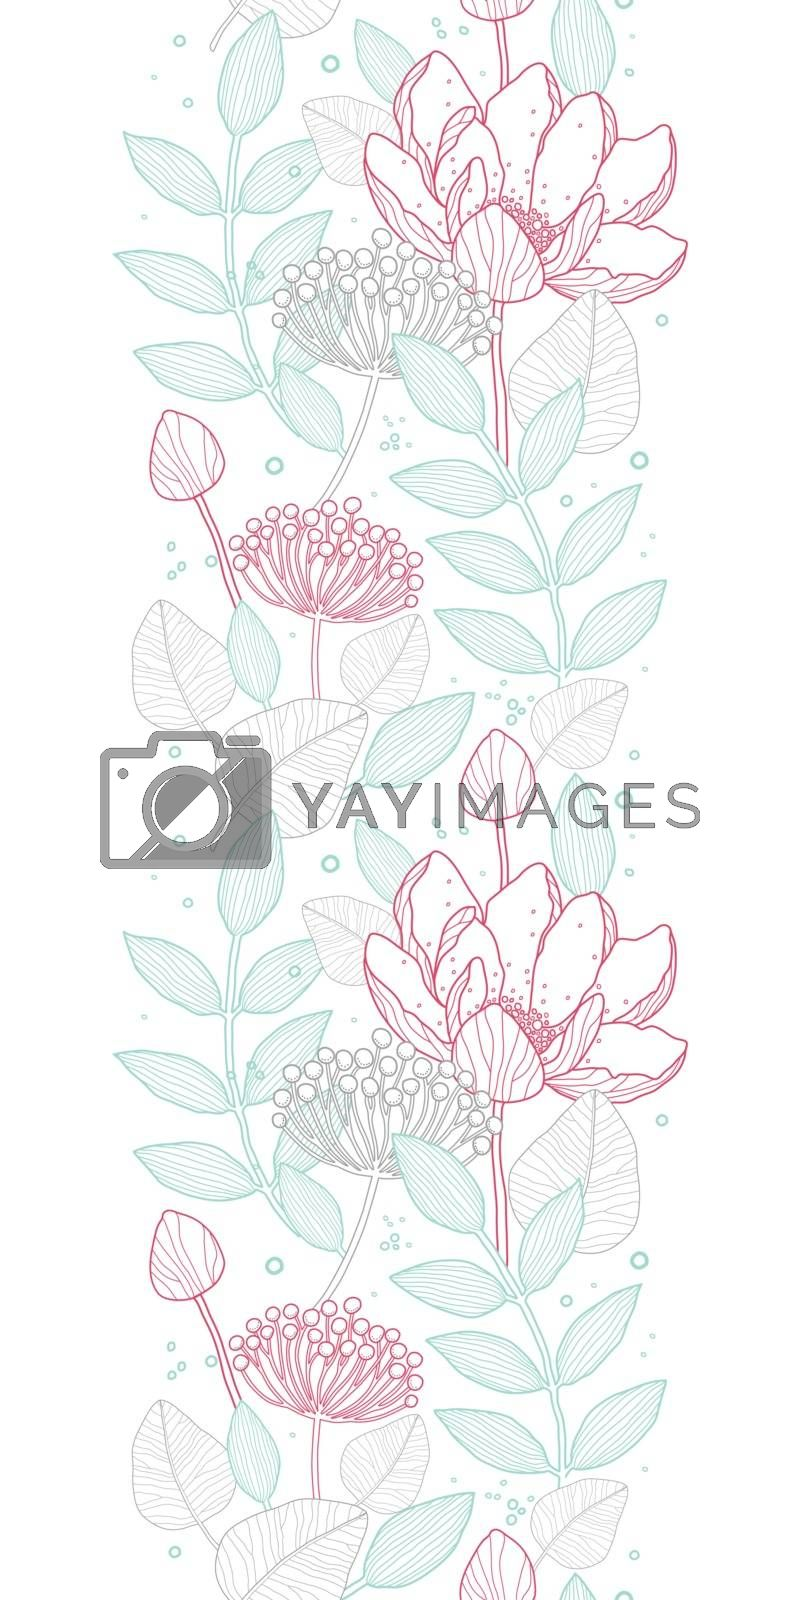 Vector modern line art florals vertical border seamless pattern background graphic design